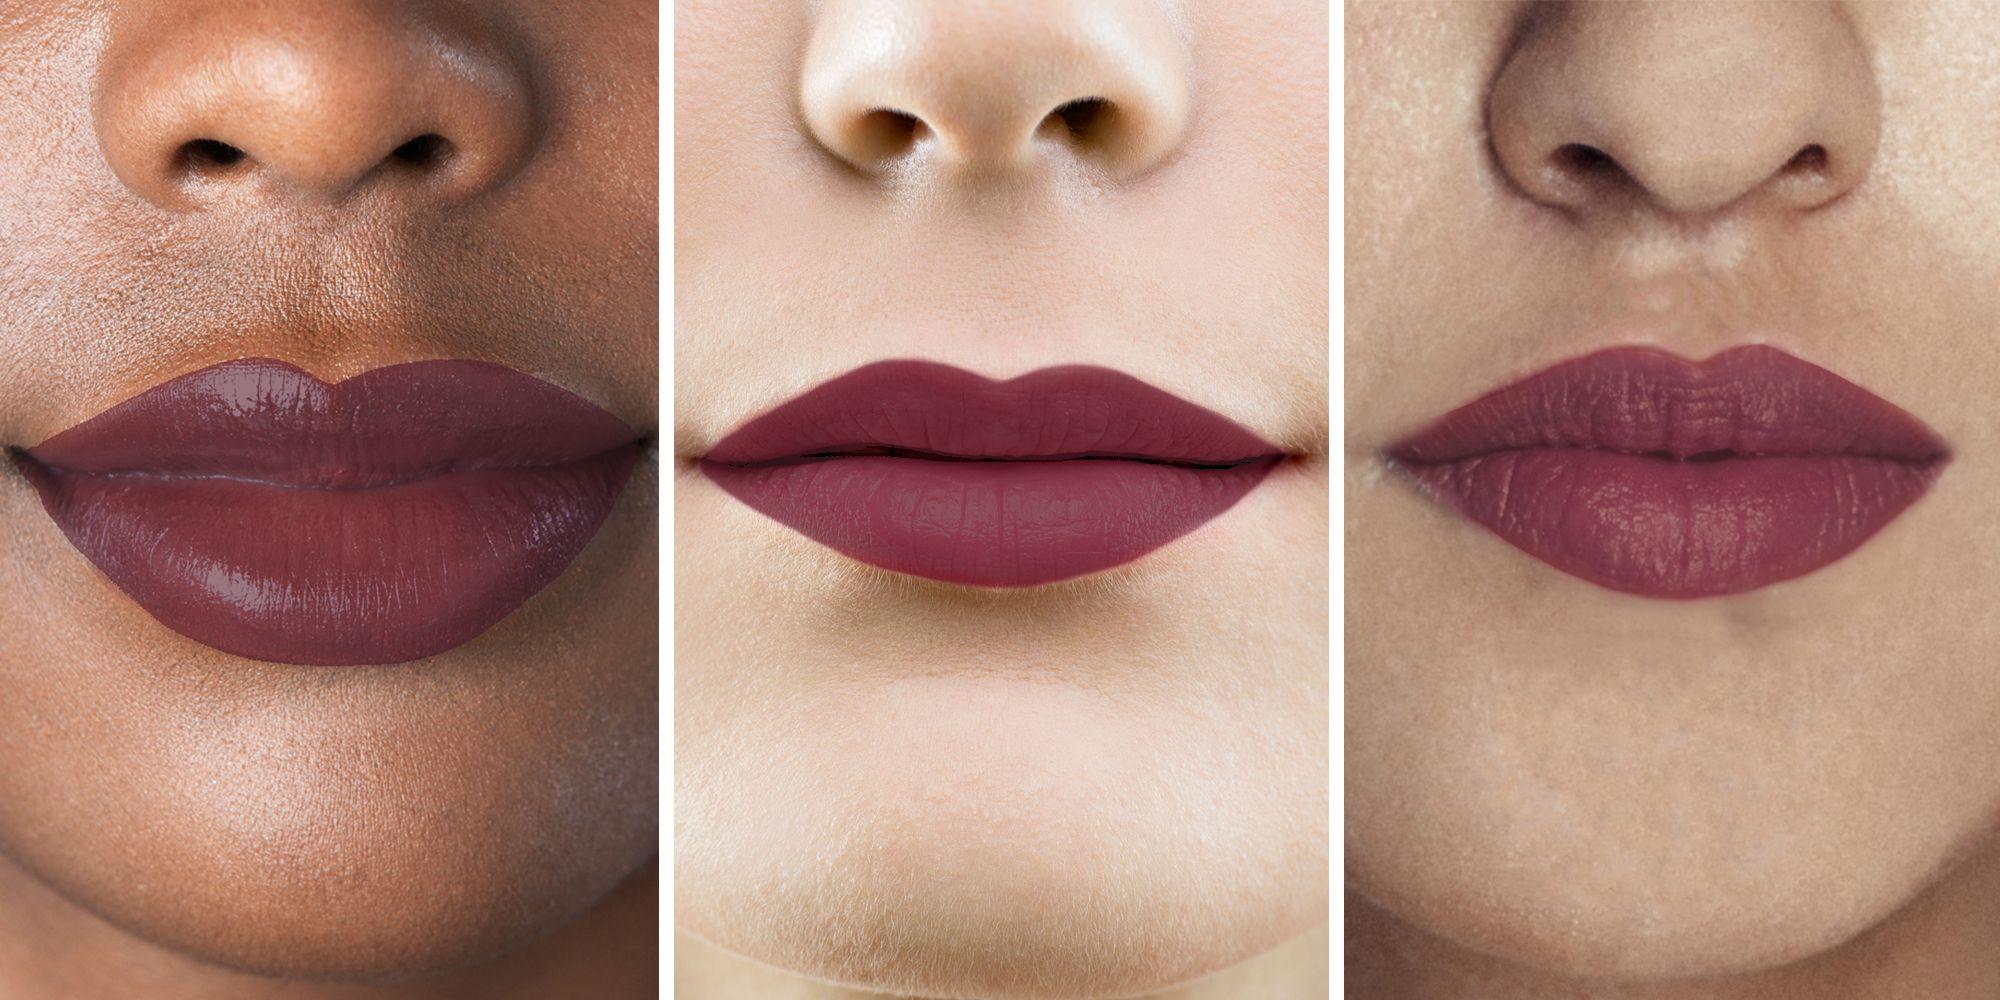 15 Best Matte Lipstick Colors - Top Matte Lip Gloss, Pencil